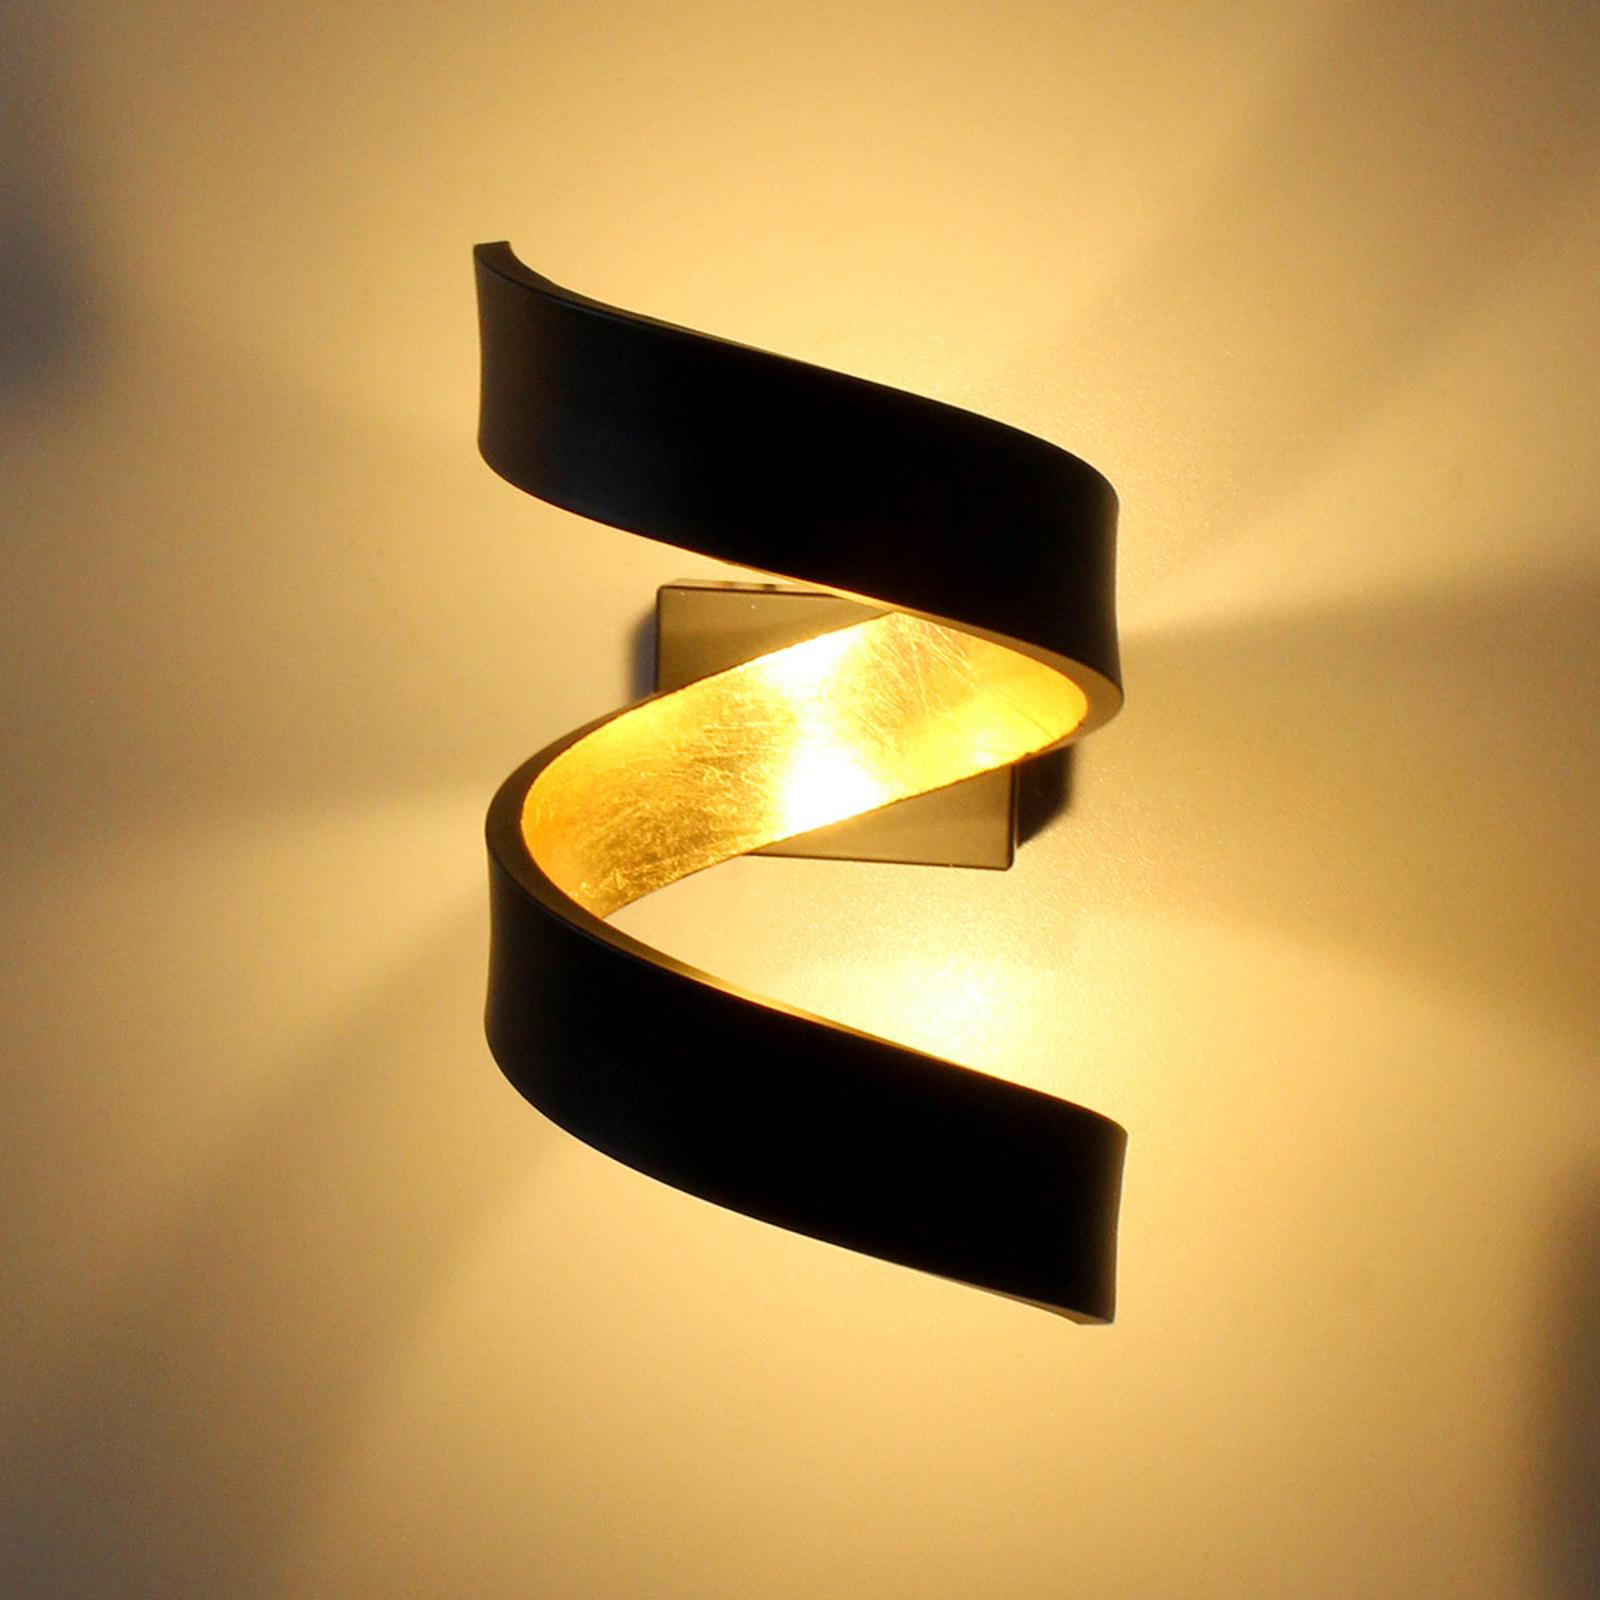 LED-Wandleuchte Helix, schwarz-gold, 17 cm